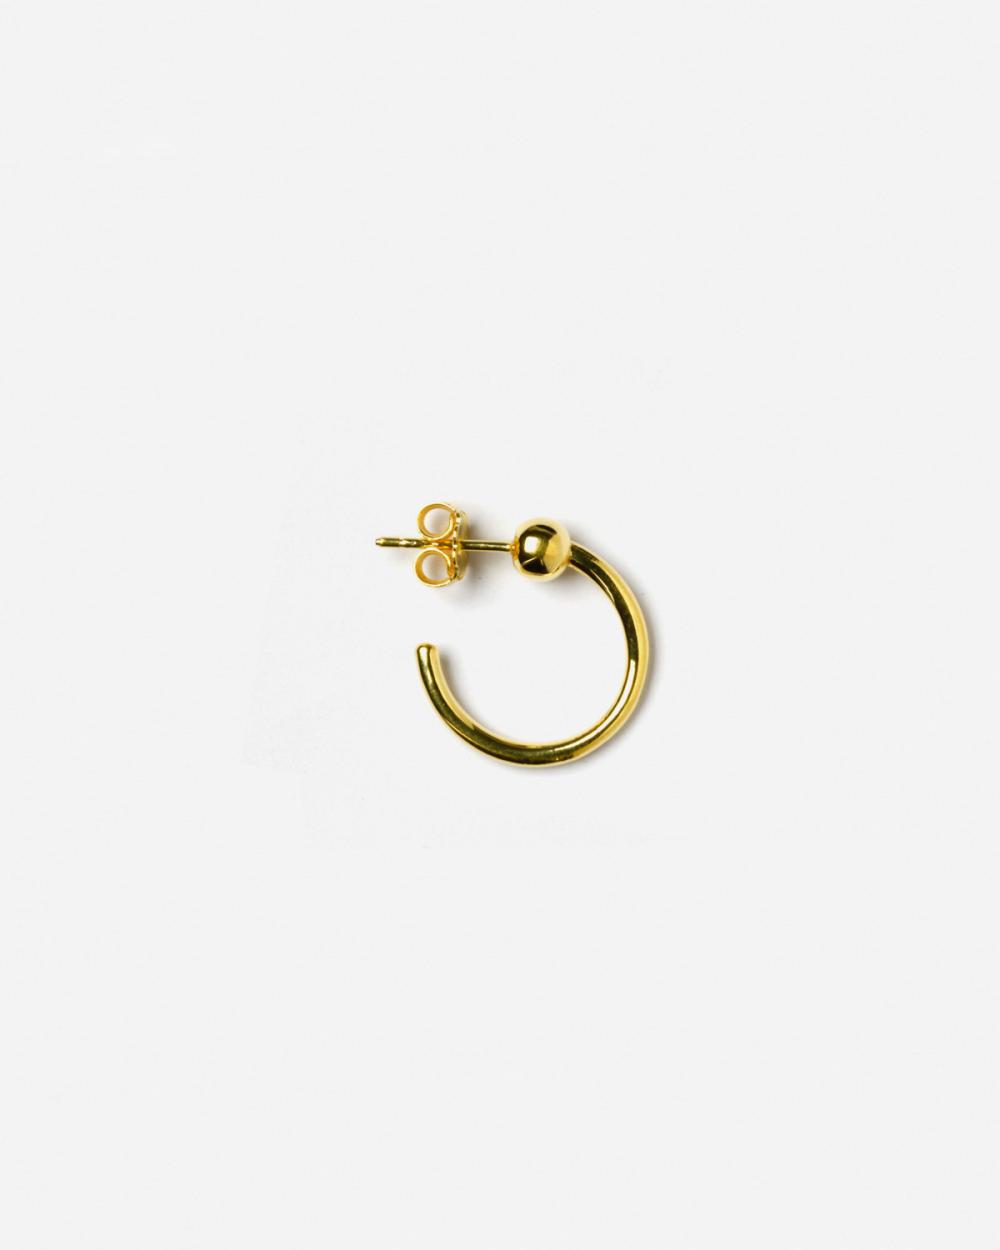 Earrings YELLOW GOLD ALPHA SINGLE EARRING NOVE25